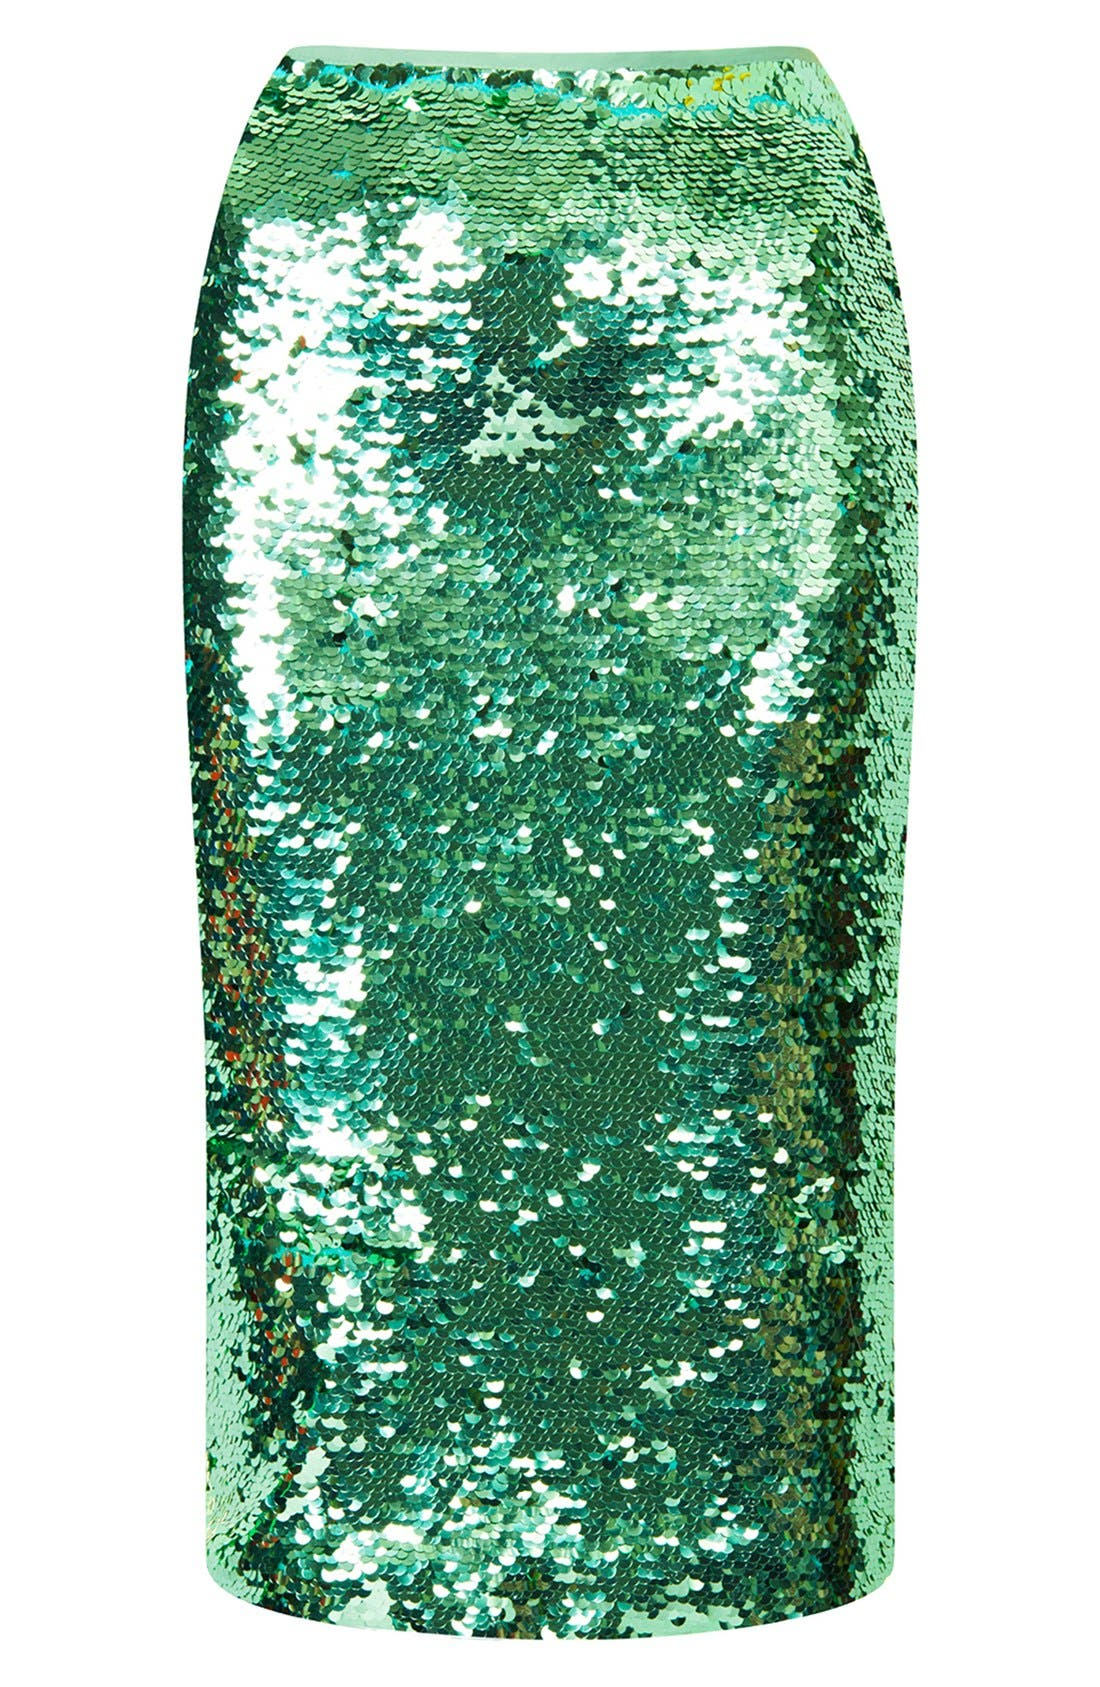 Sequin Pencil Skirt,                             Alternate thumbnail 2, color,                             330